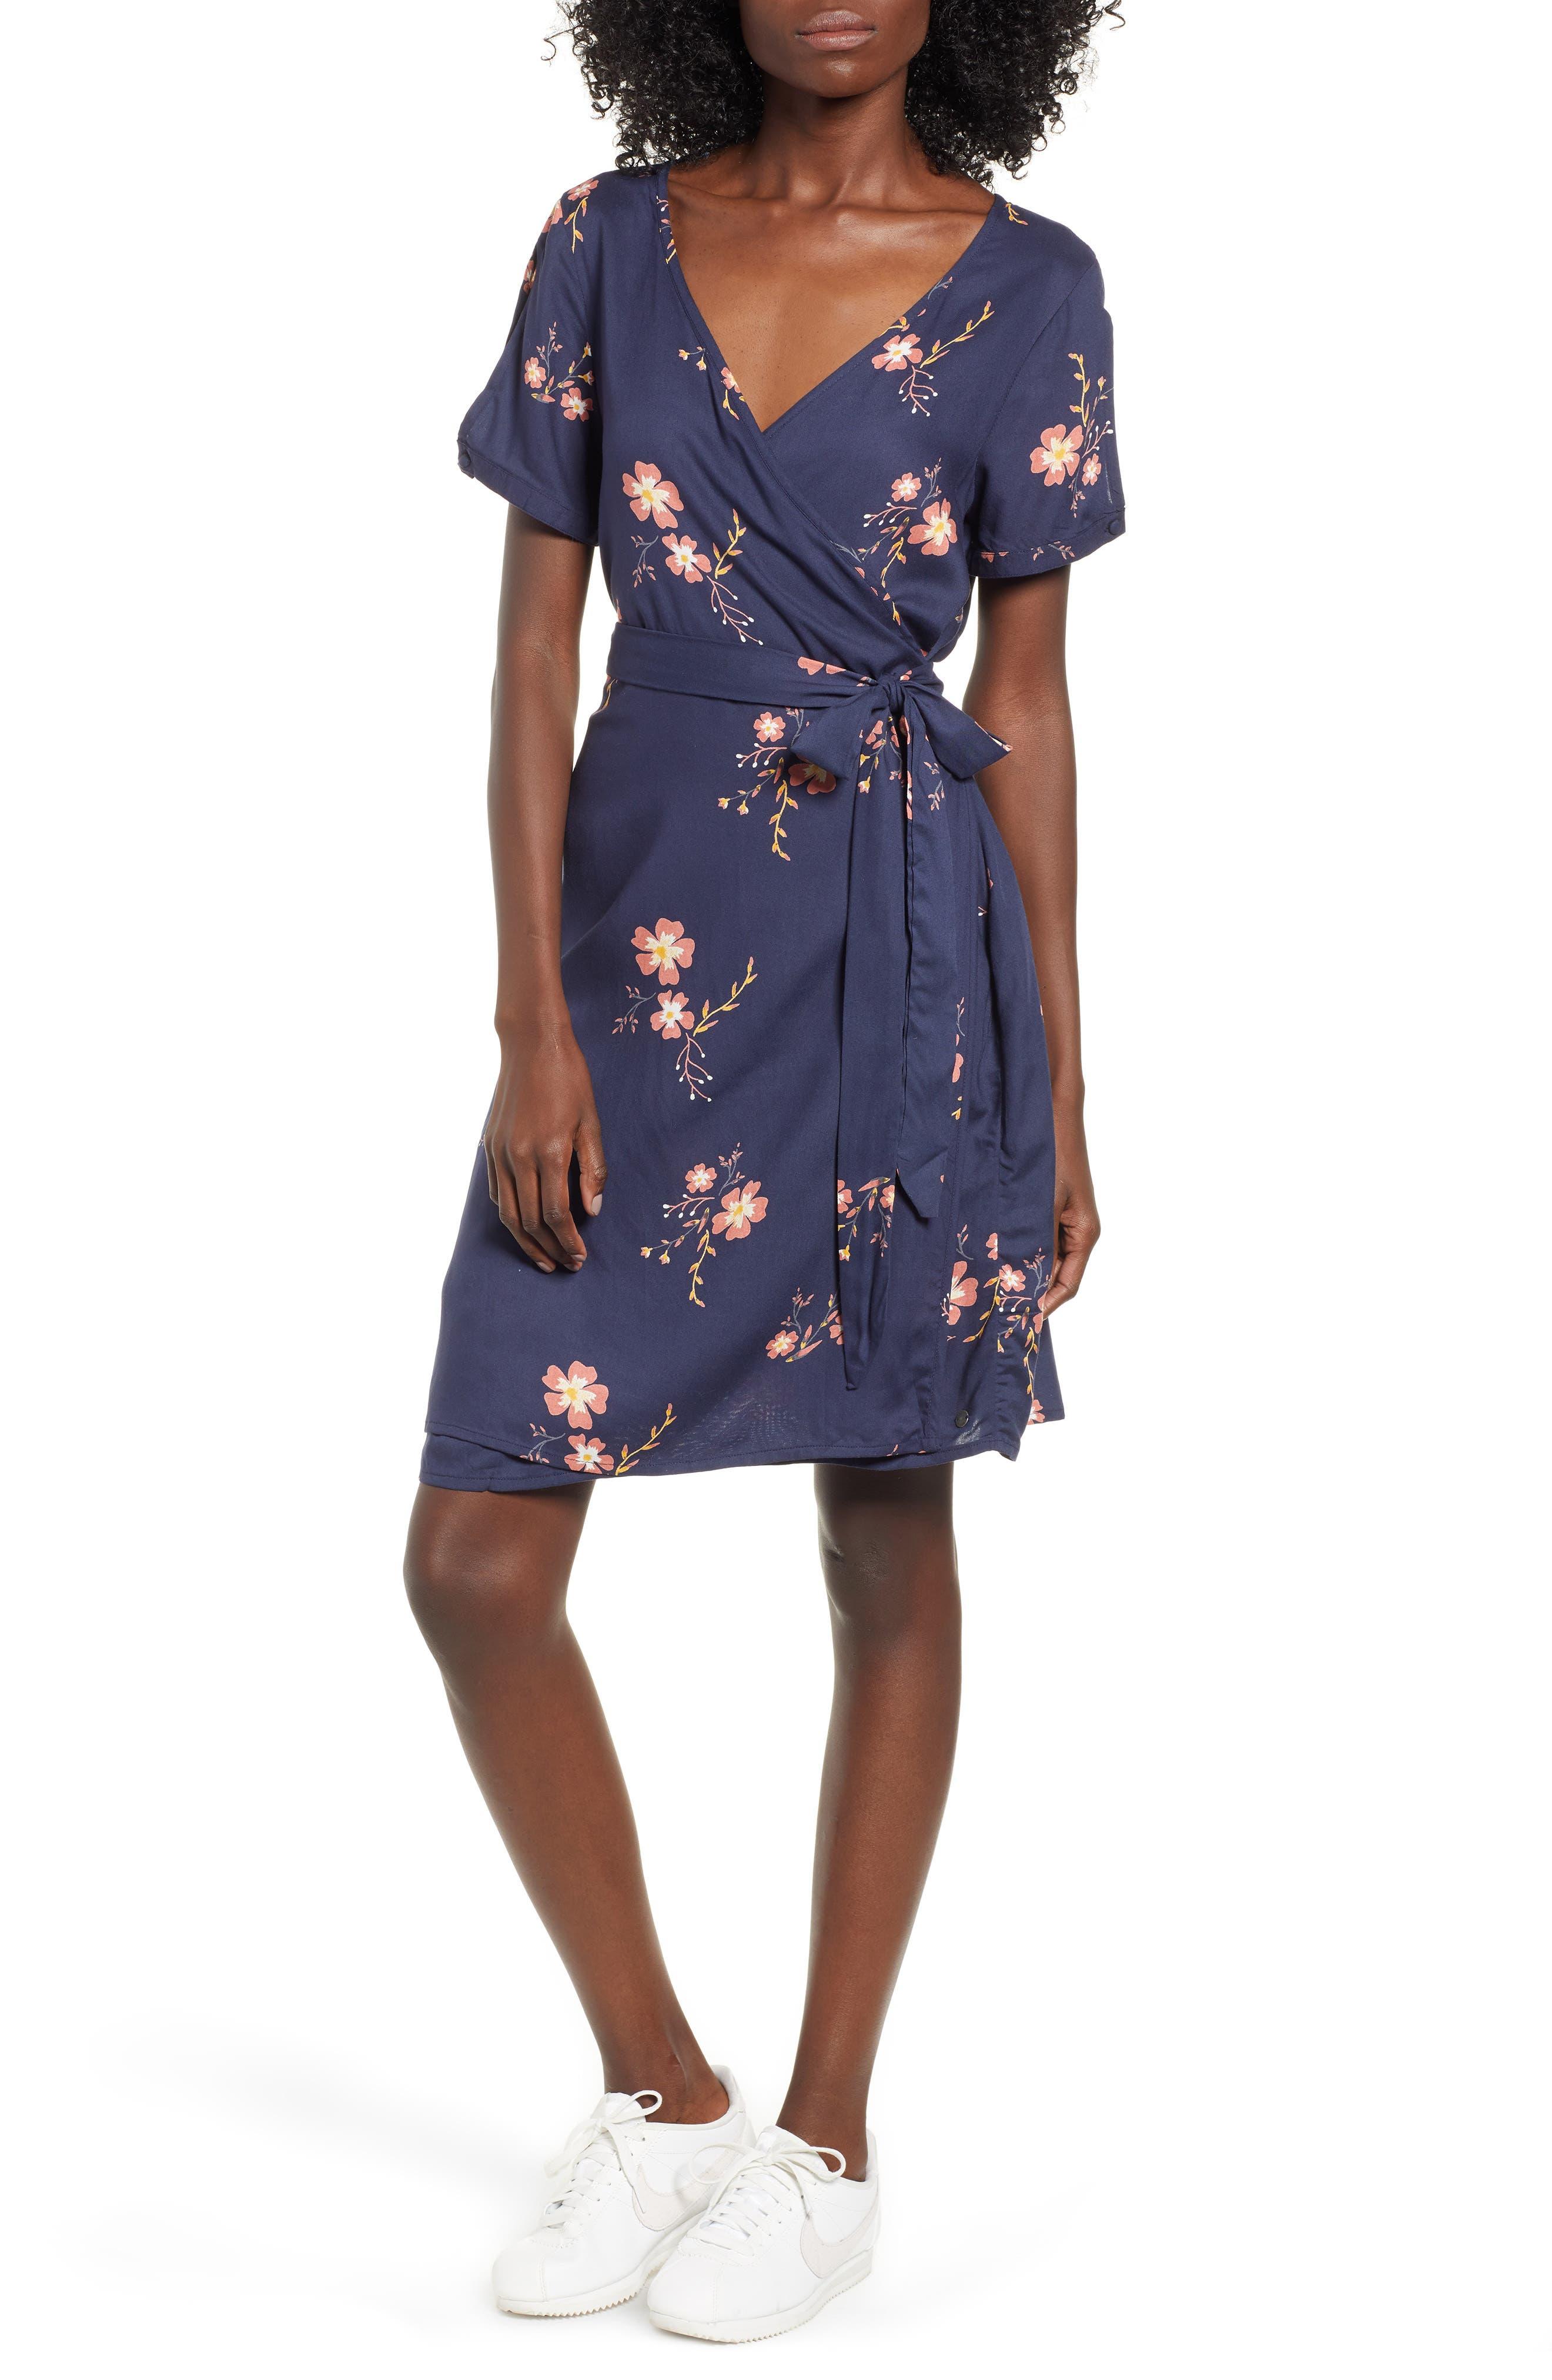 Roxy Monument View Floral Print Wrap Dress, Blue